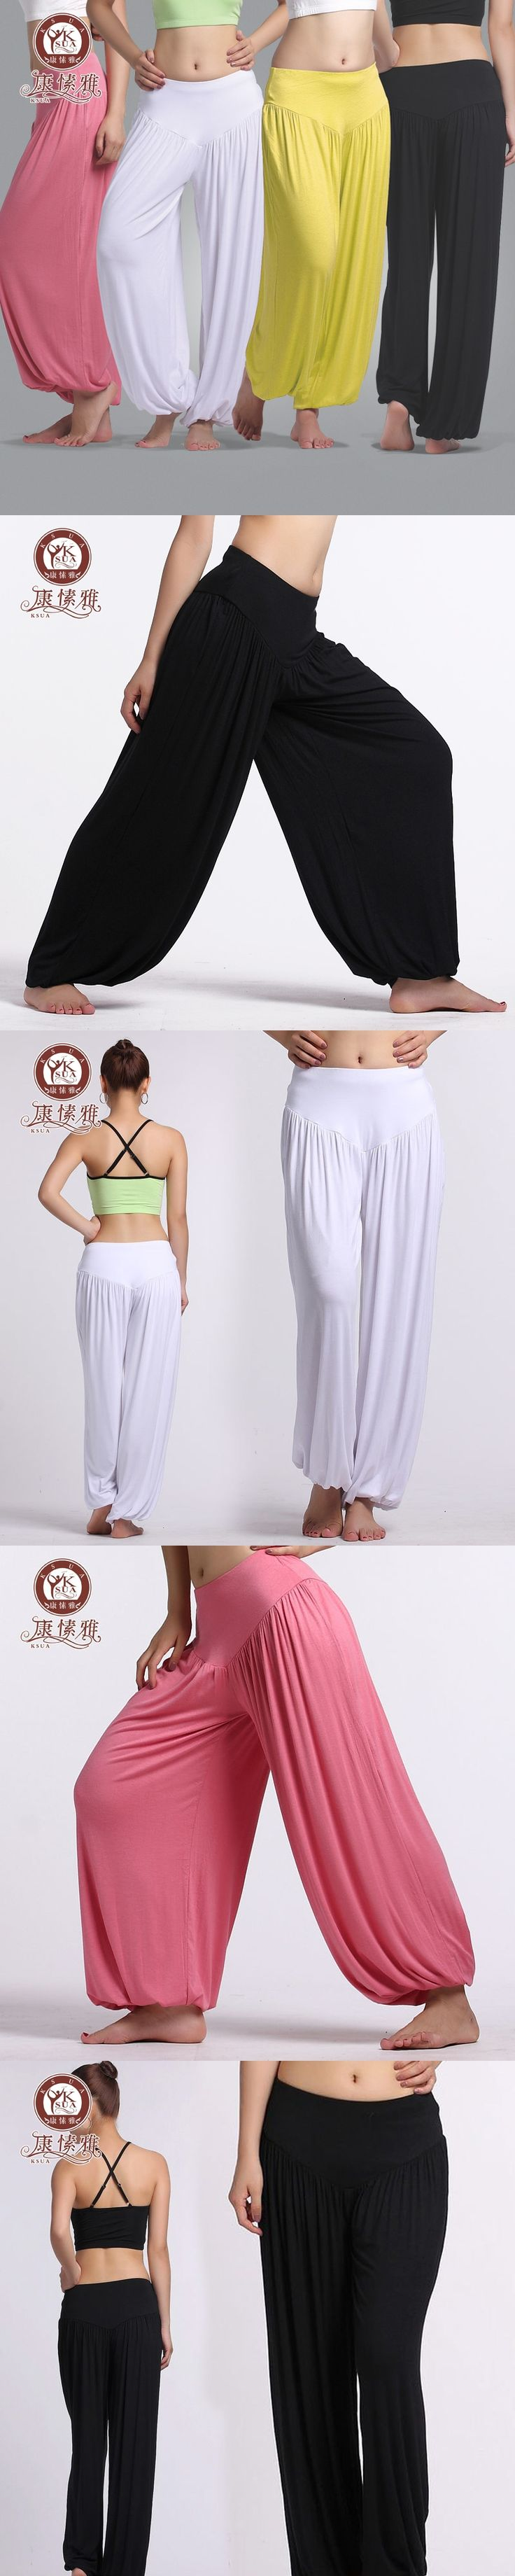 Women Gym Sport Dance Bra Suits Tracksuits Yoga Shirt Jump Pants Loose Yoga Sportswear Set Zen Meditation Clothing Large Size